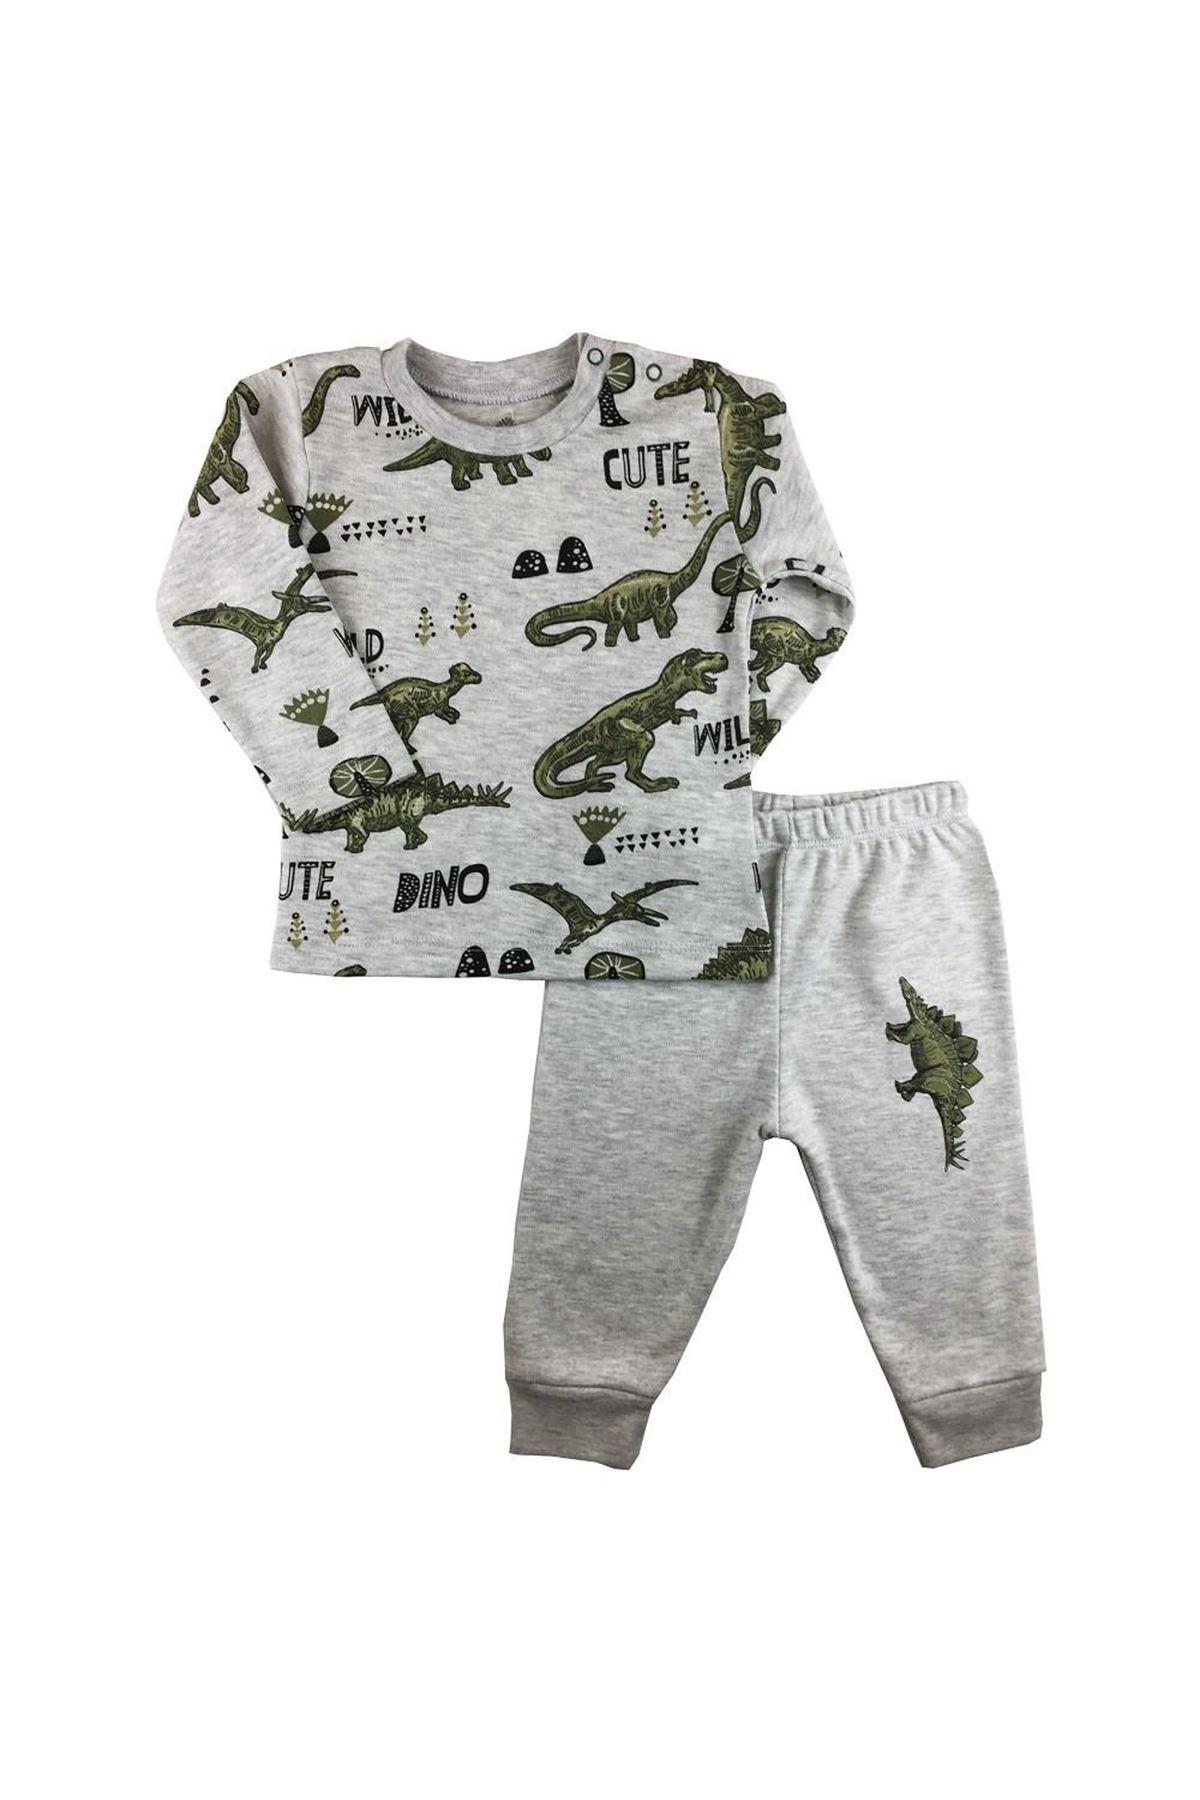 Luggi Baby Dino Friends Emprime 2li Bebe Takım LG-6231 Karışık Renkli